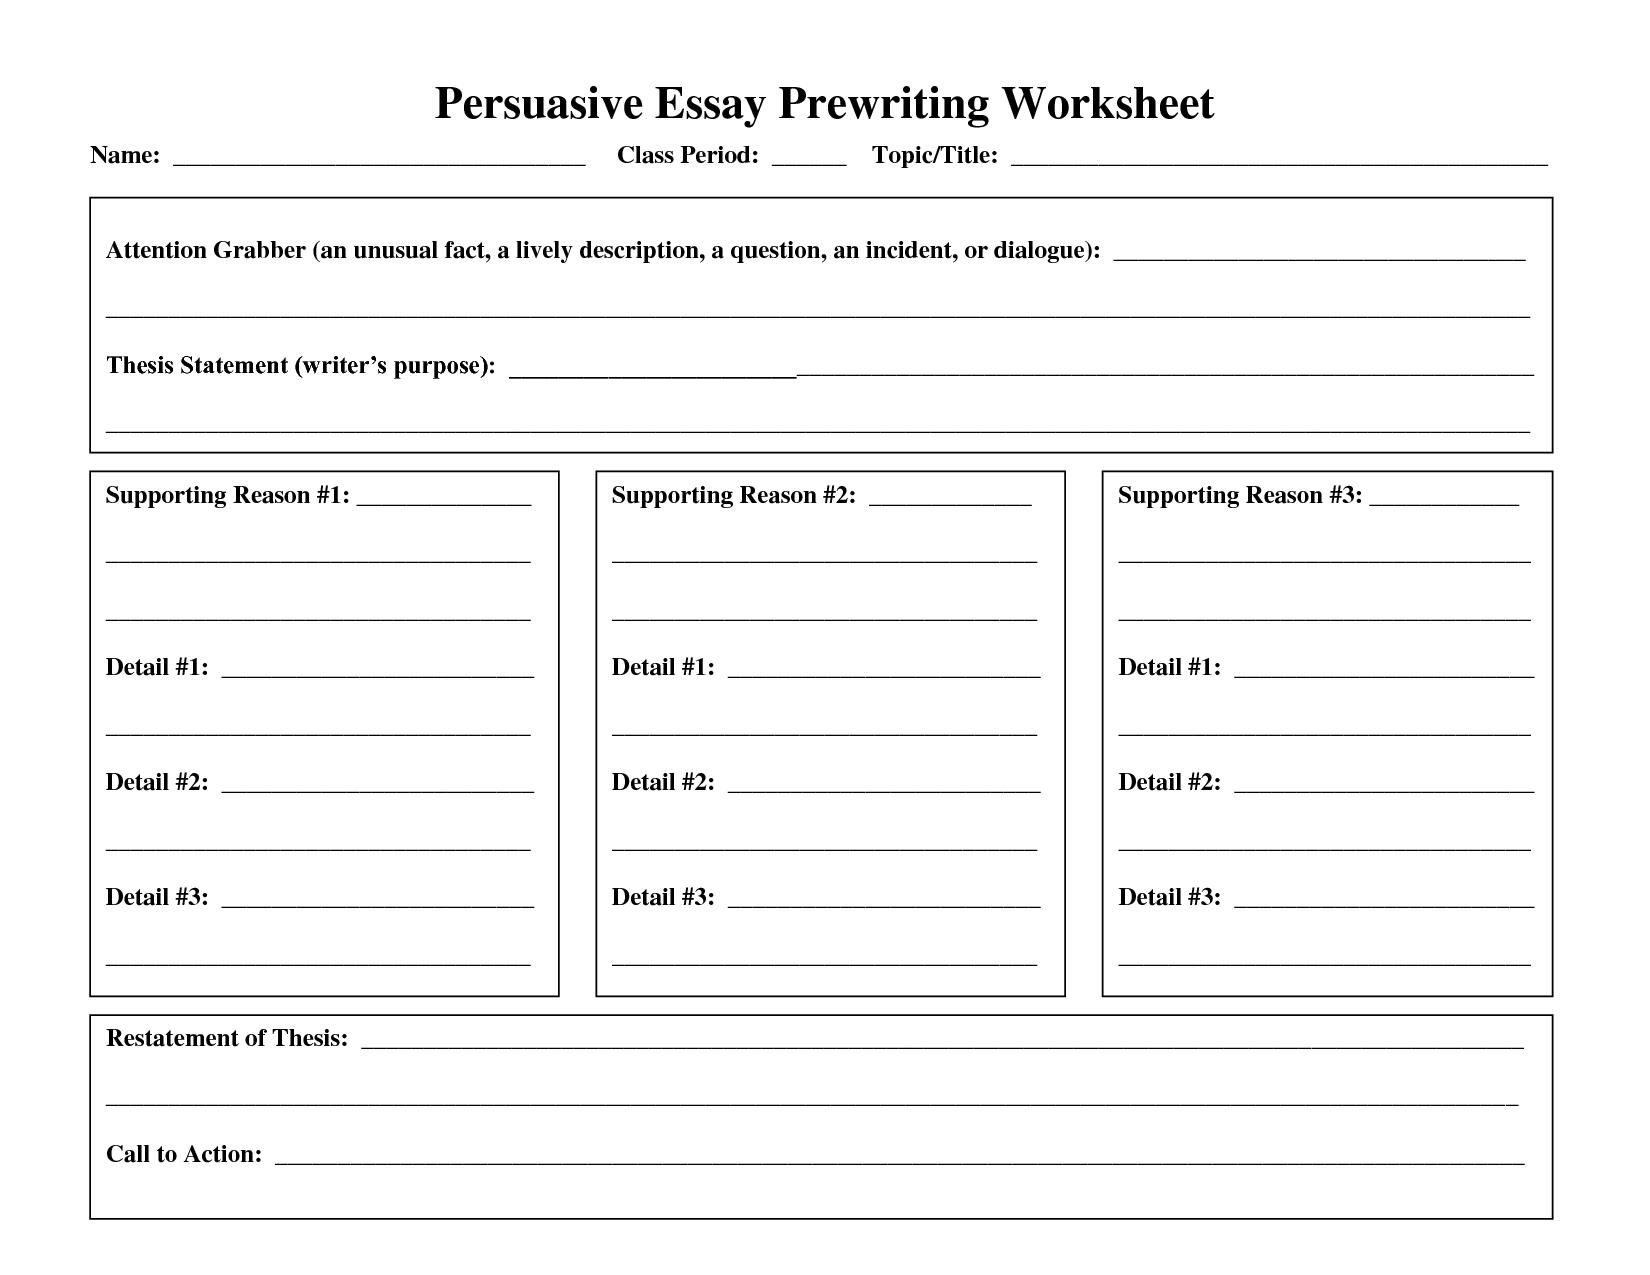 Uncg critical thinking skills evaluation instrument